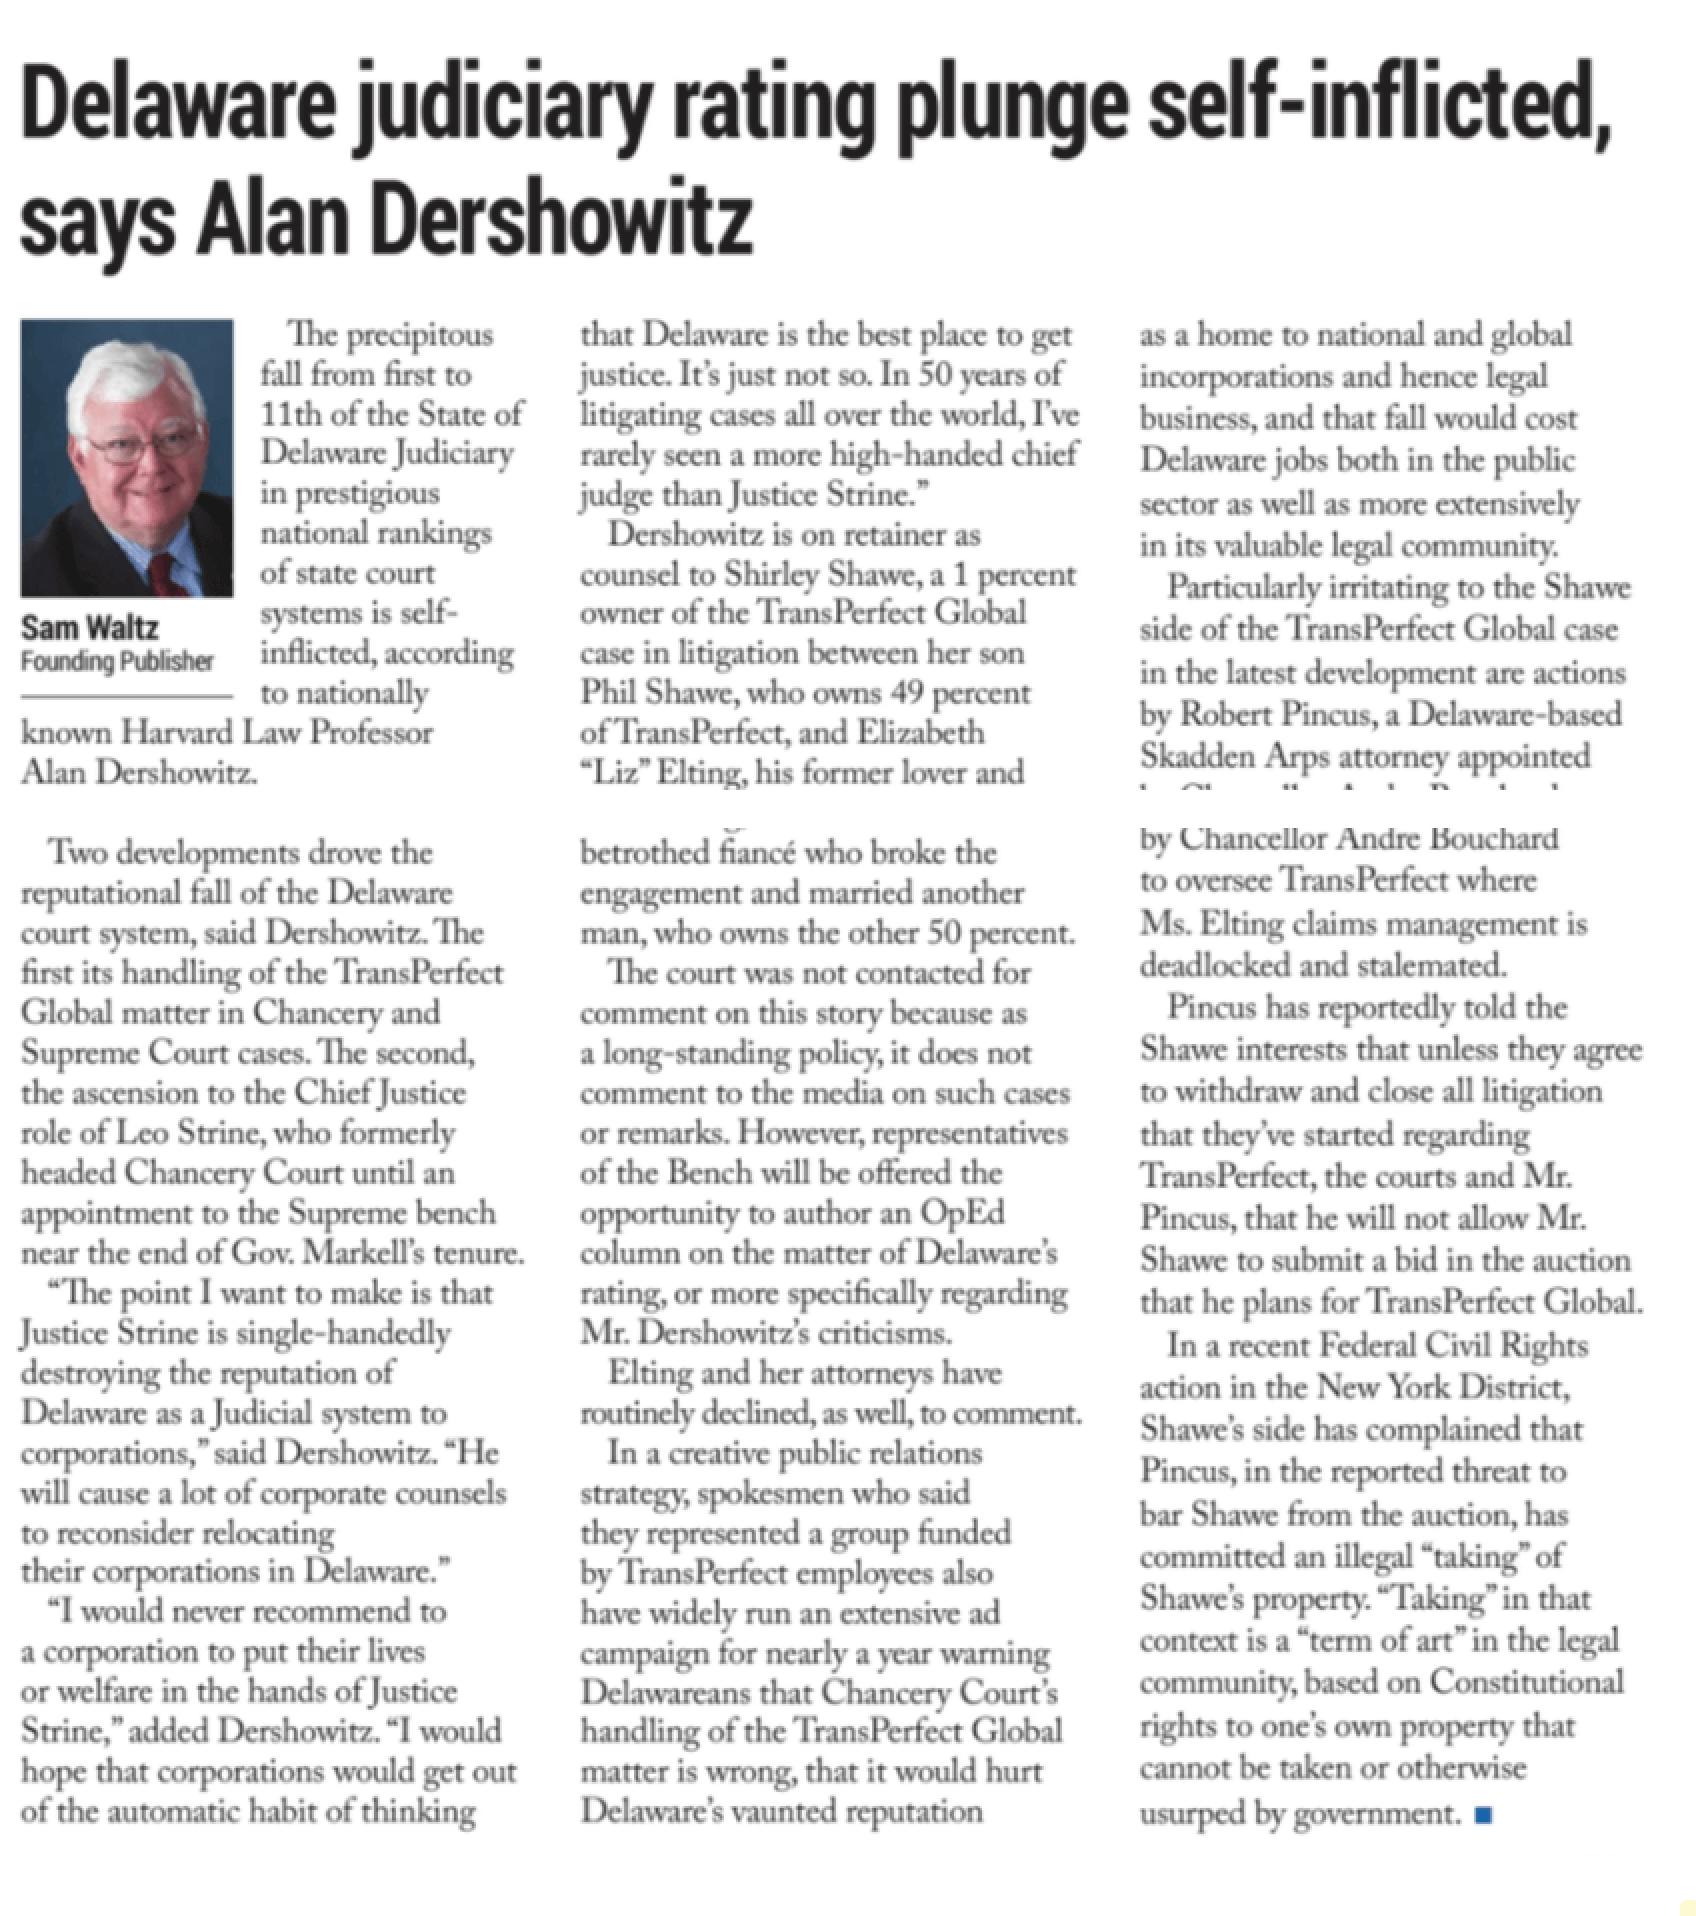 Delaware judiciary rating plunge self-inflicted, says Alan Dershowitz